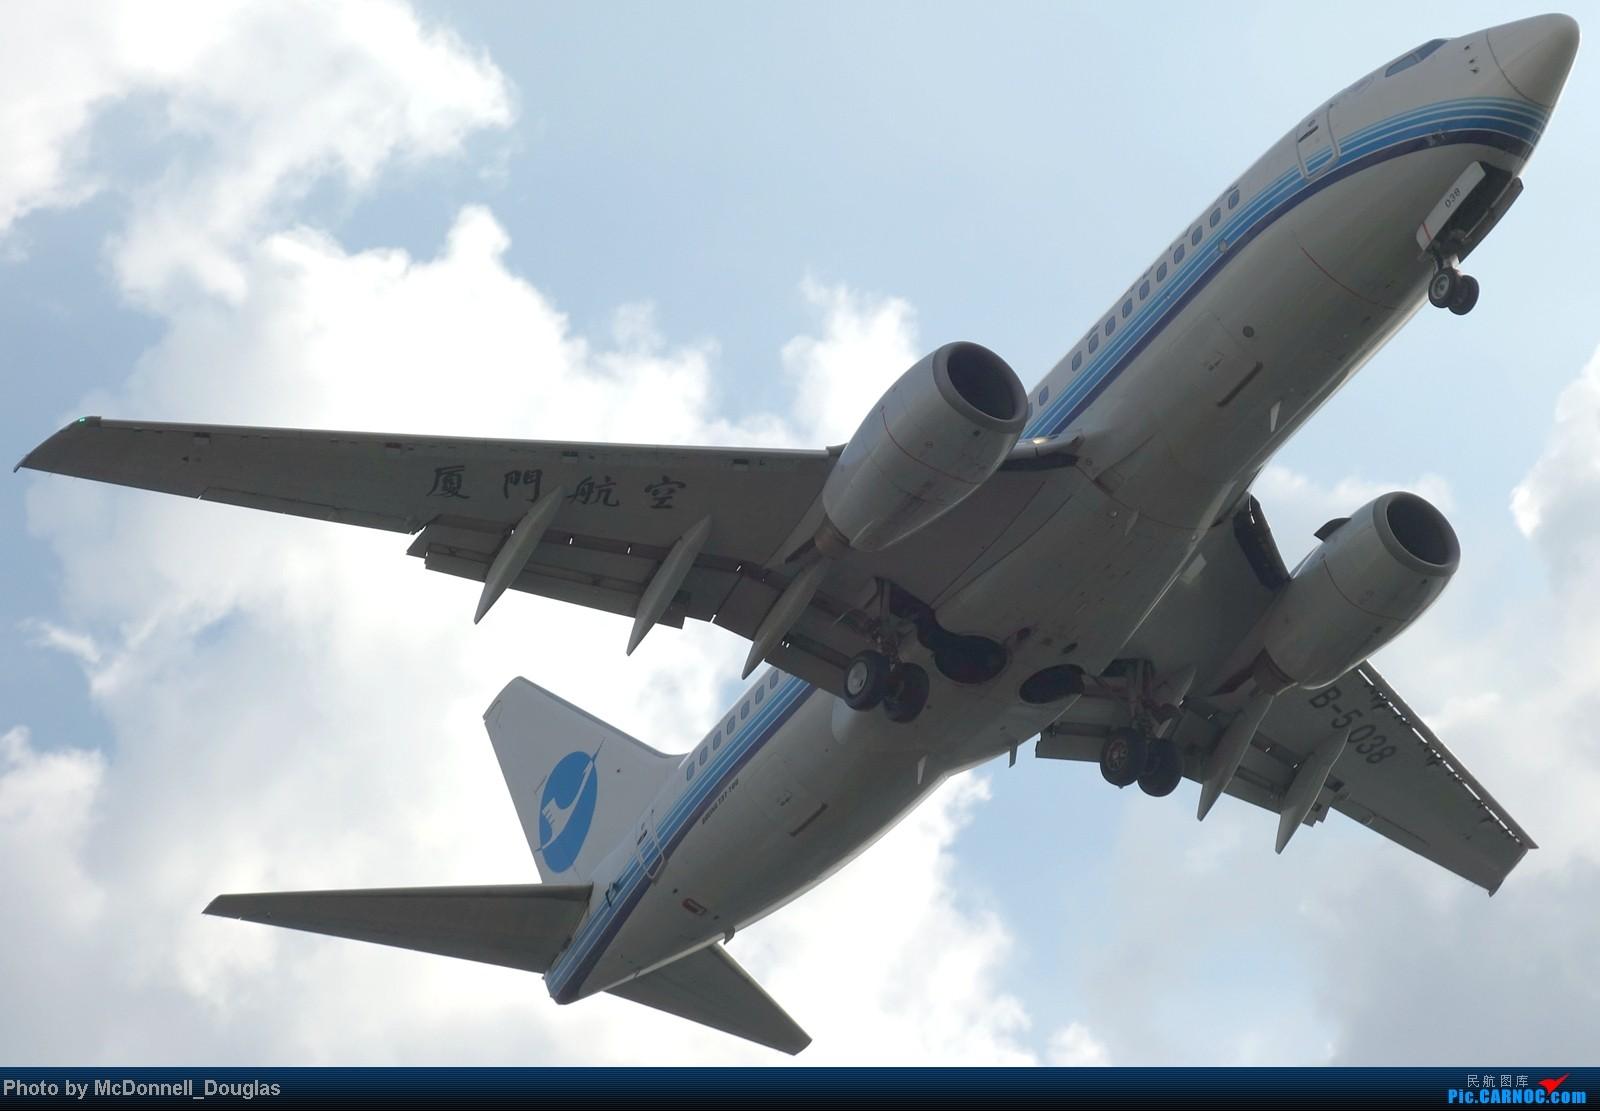 Re:[原创]【上海飞友会】ZSSS杂图一组 BOEING 737-700 B-5038 中国上海虹桥机场